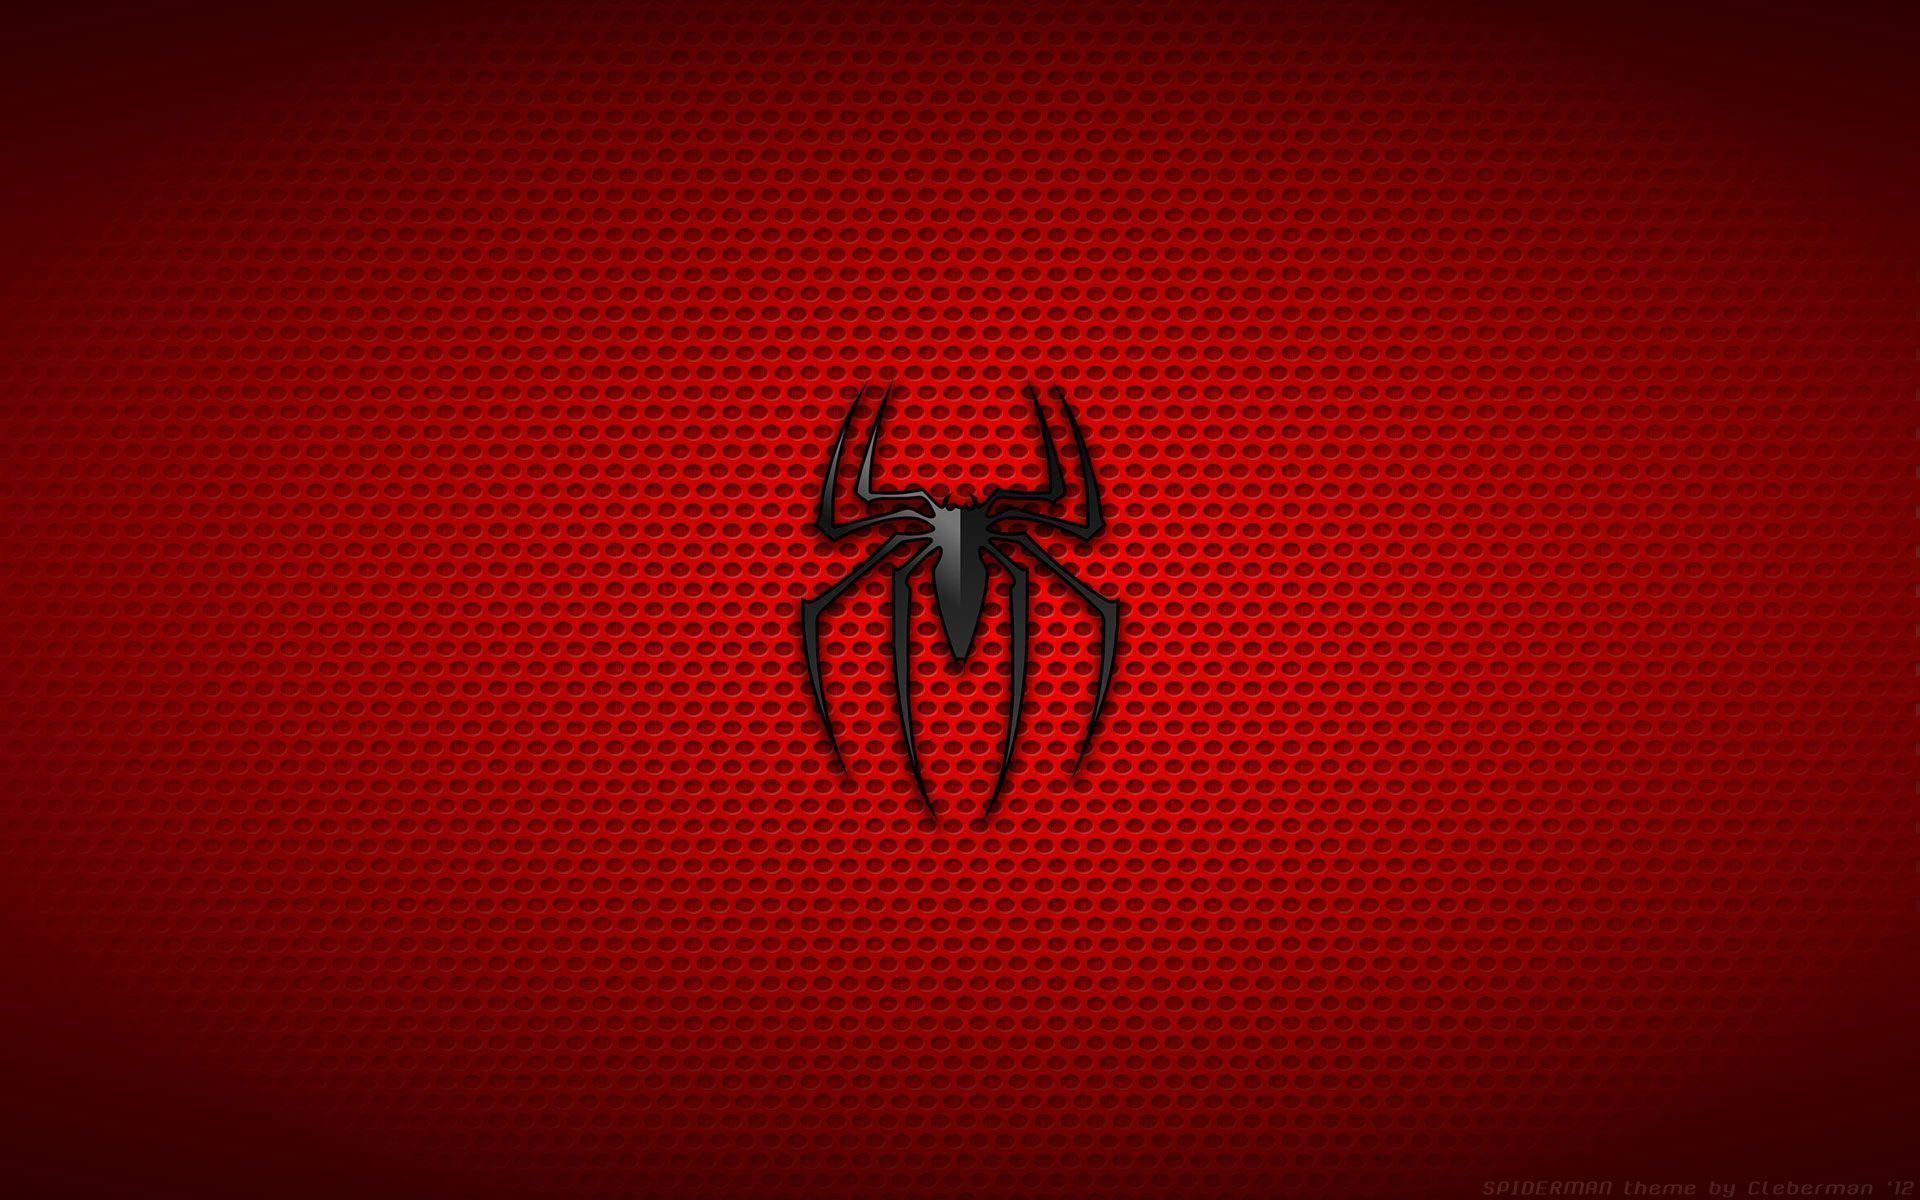 Marvel Spiderman Logo Wallpapers Top Free Marvel Spiderman